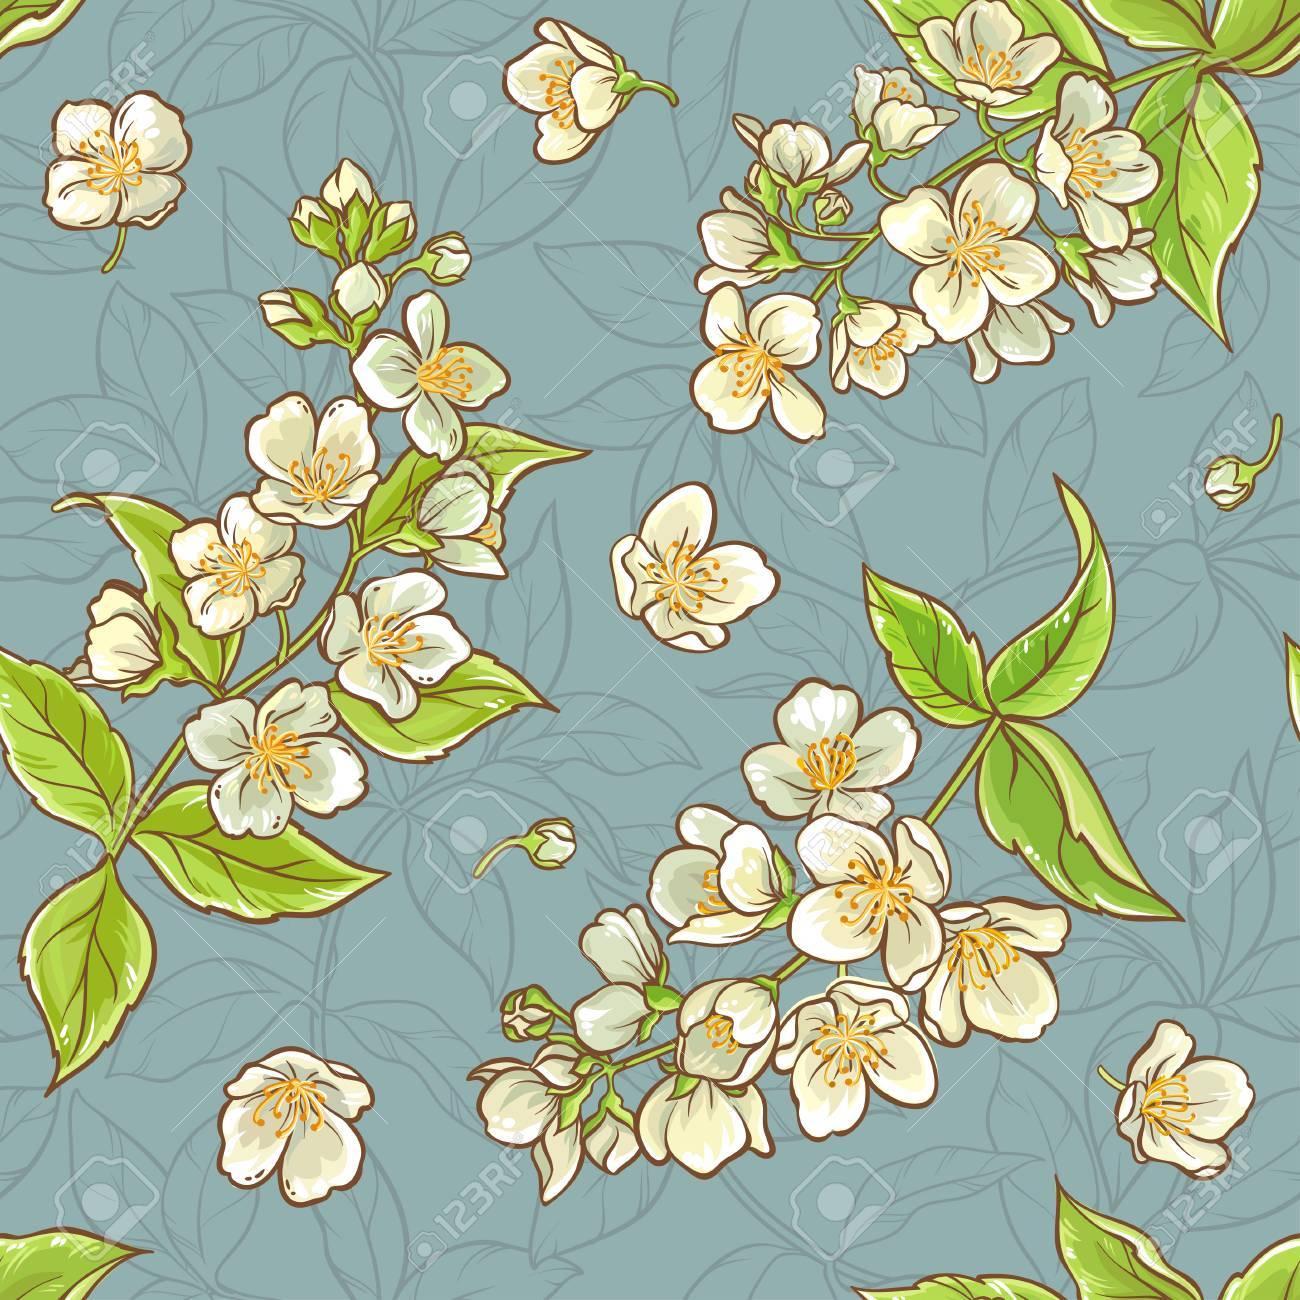 Jasmine flowers color vector seamless pattern on blue background jasmine flowers color vector seamless pattern on blue background stock vector 67870526 izmirmasajfo